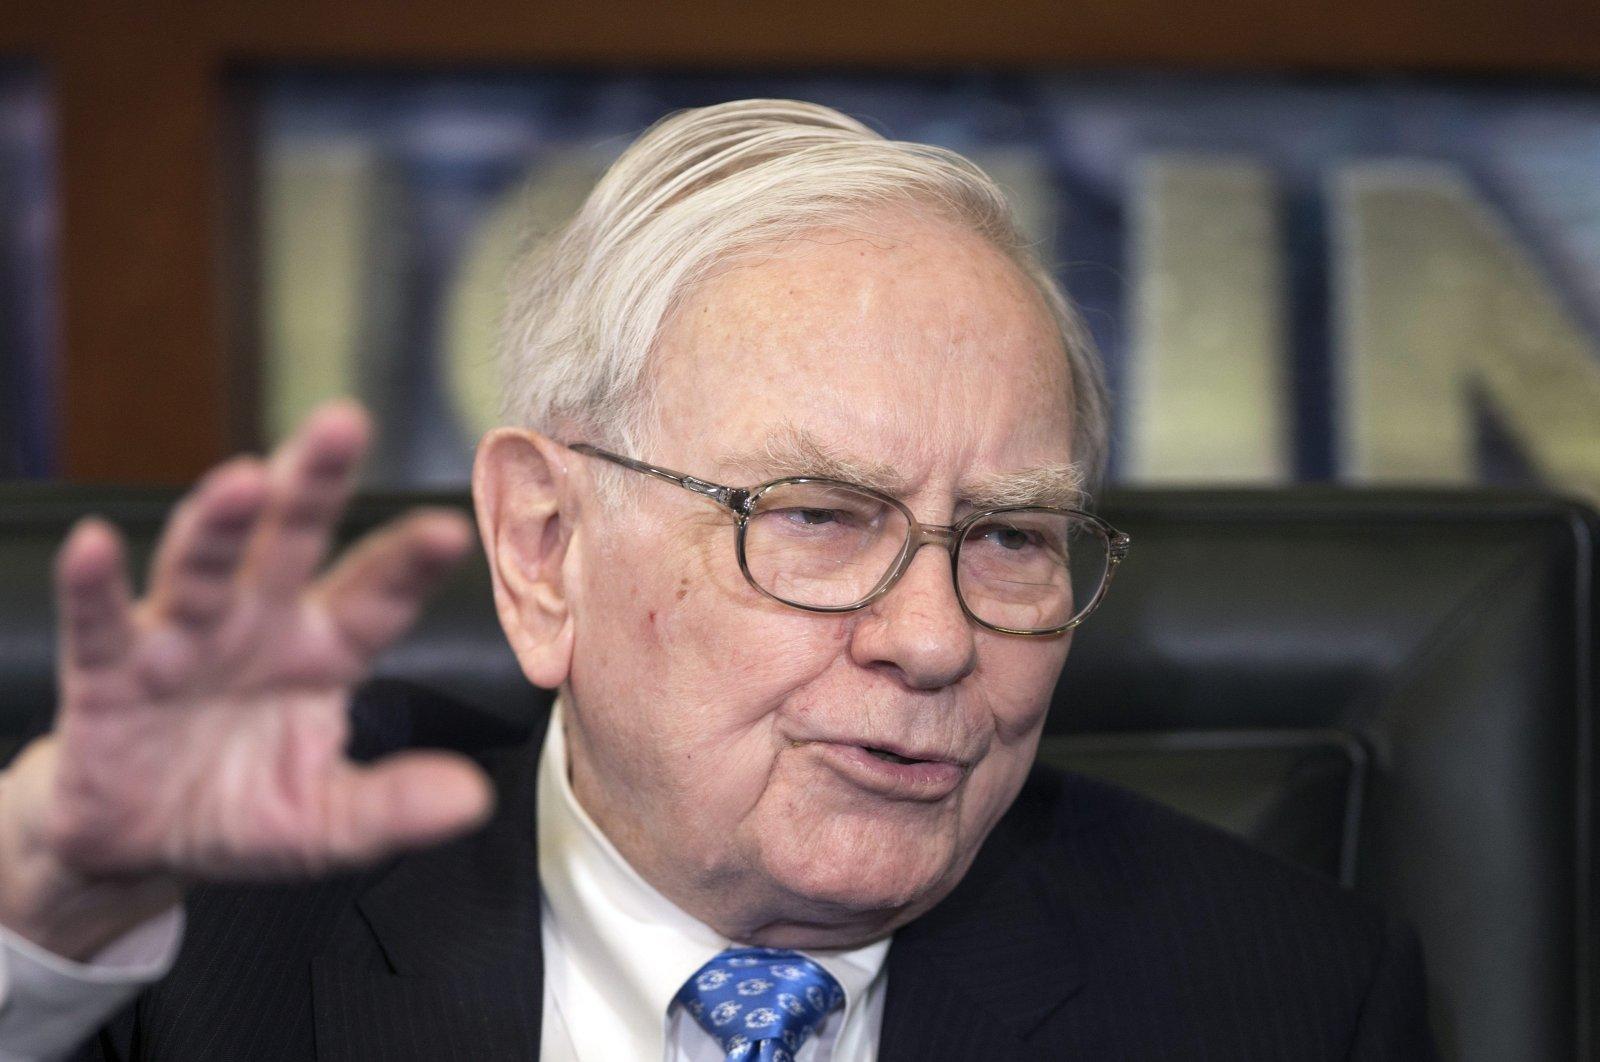 Berkshire Hathaway CEO Warren Buffet speaks during an interview in Omaha, Nebraska, U.S., May 6, 2013. (AP Photo)